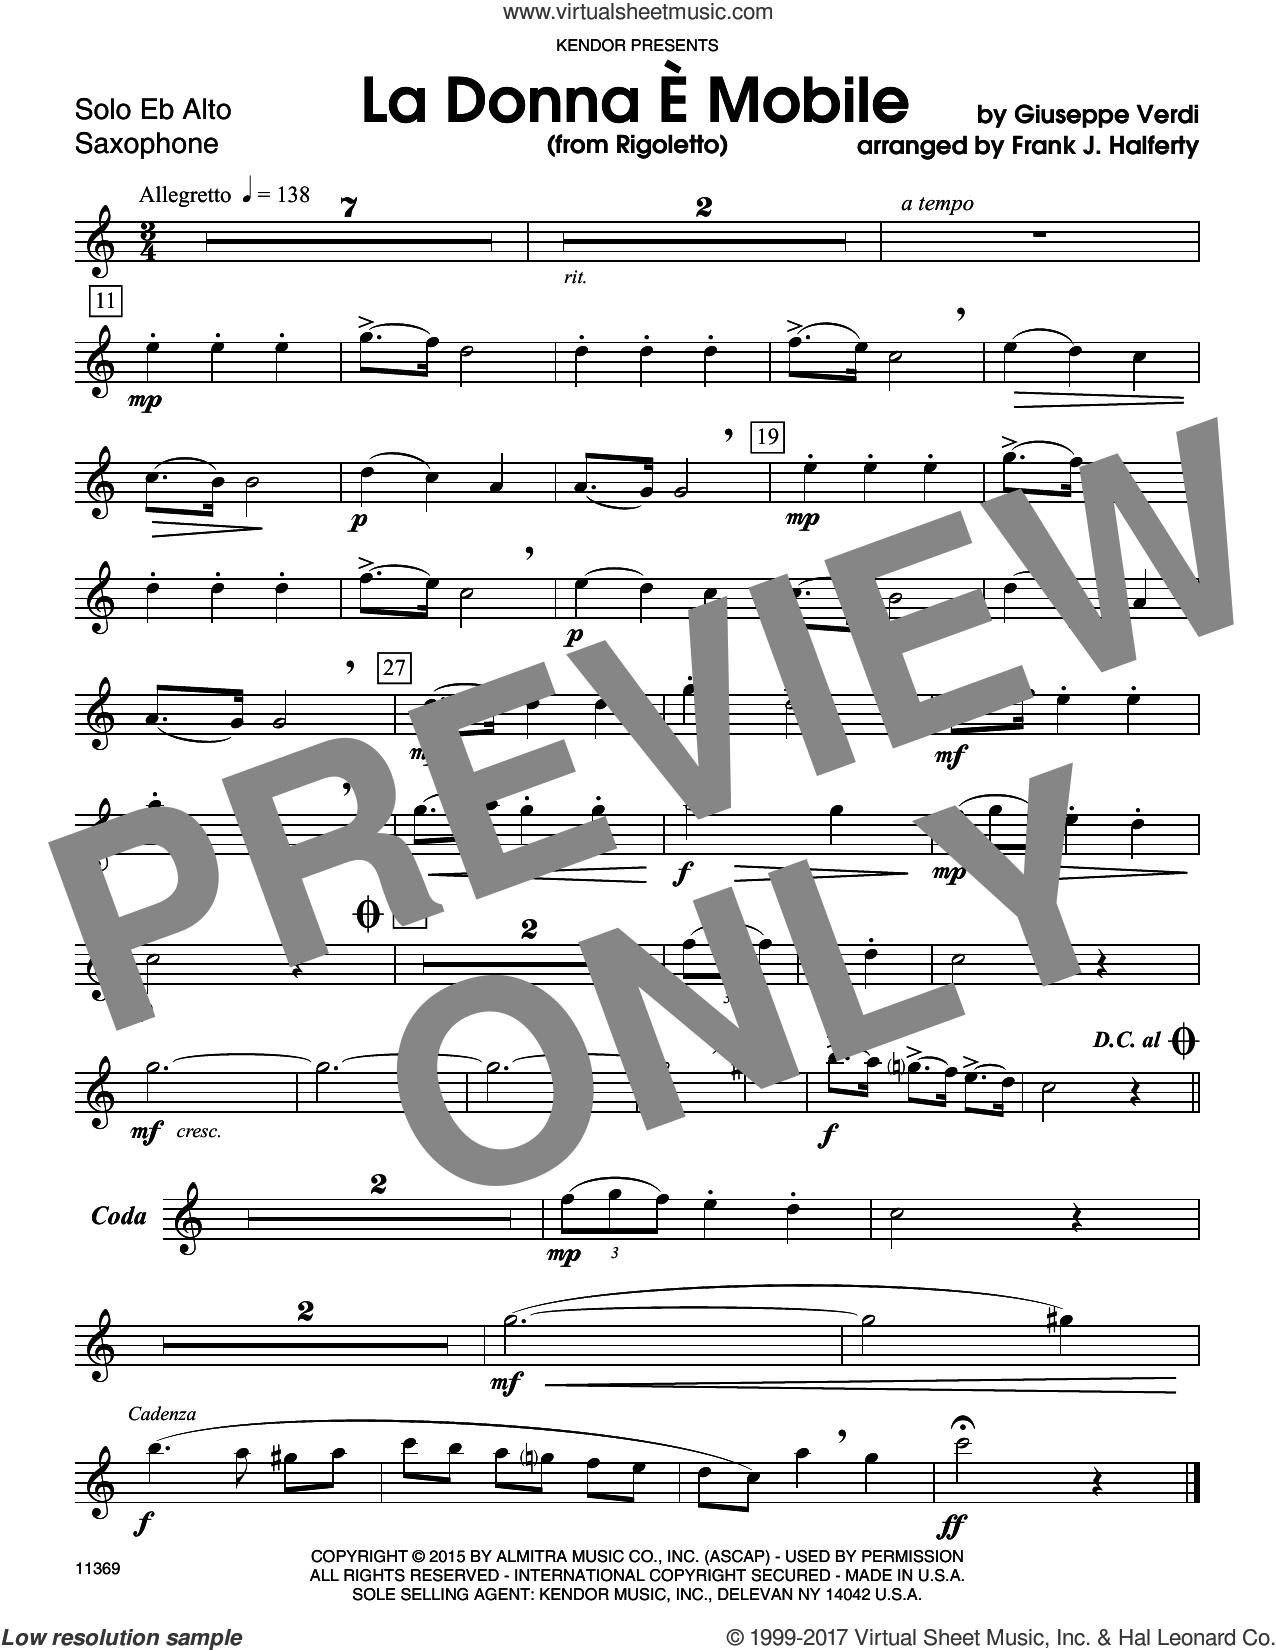 La Donna E Mobile (from Rigoletto) (complete set of parts) sheet music for alto saxophone and piano by Giuseppe Verdi and Frank J. Halferty, classical score, intermediate skill level